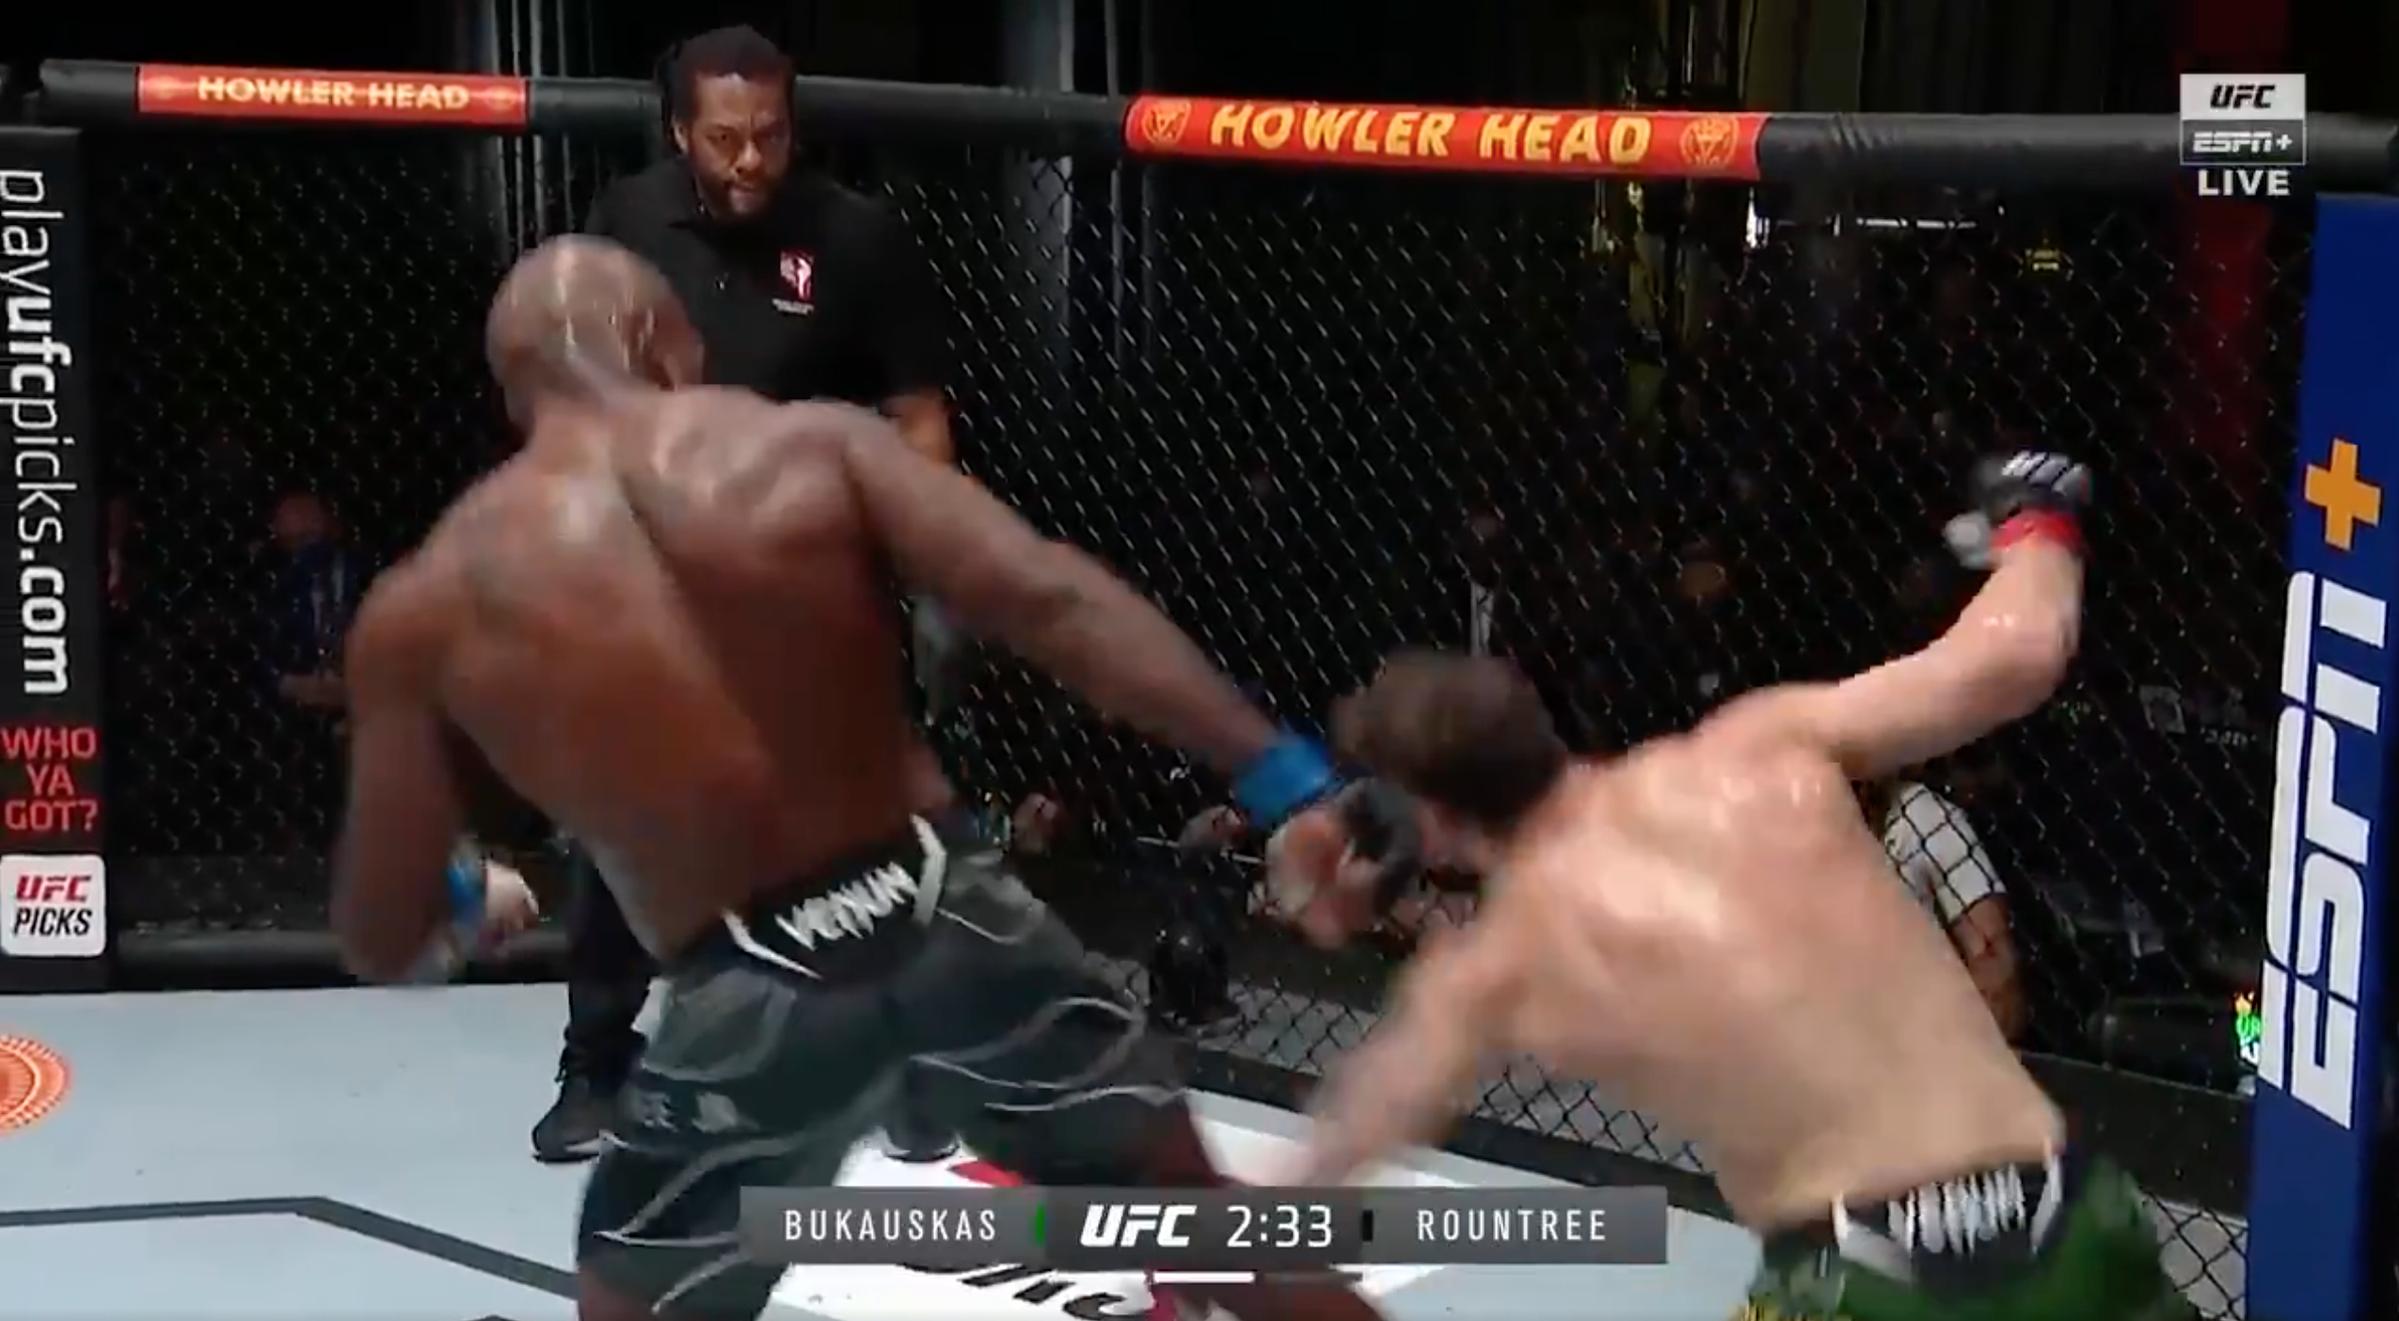 Roundtree's knock-out kick.